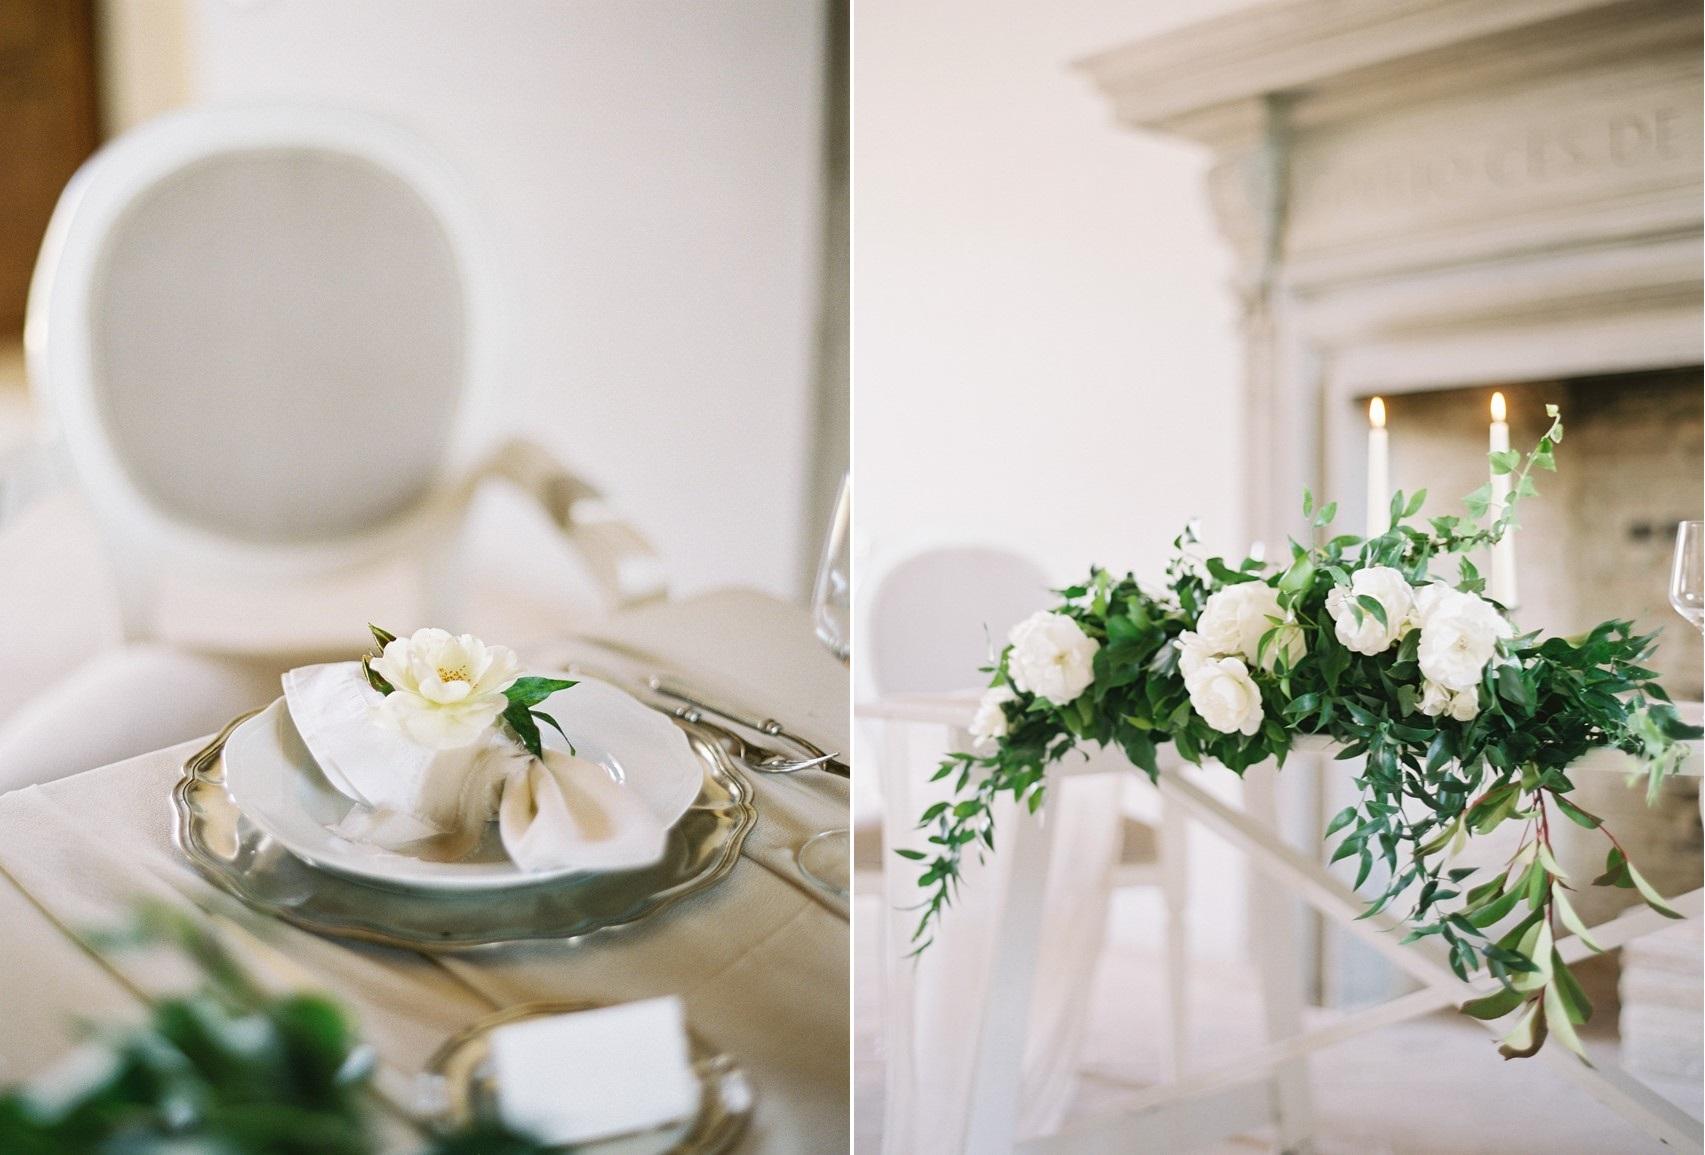 White & Greenery Wedding Table